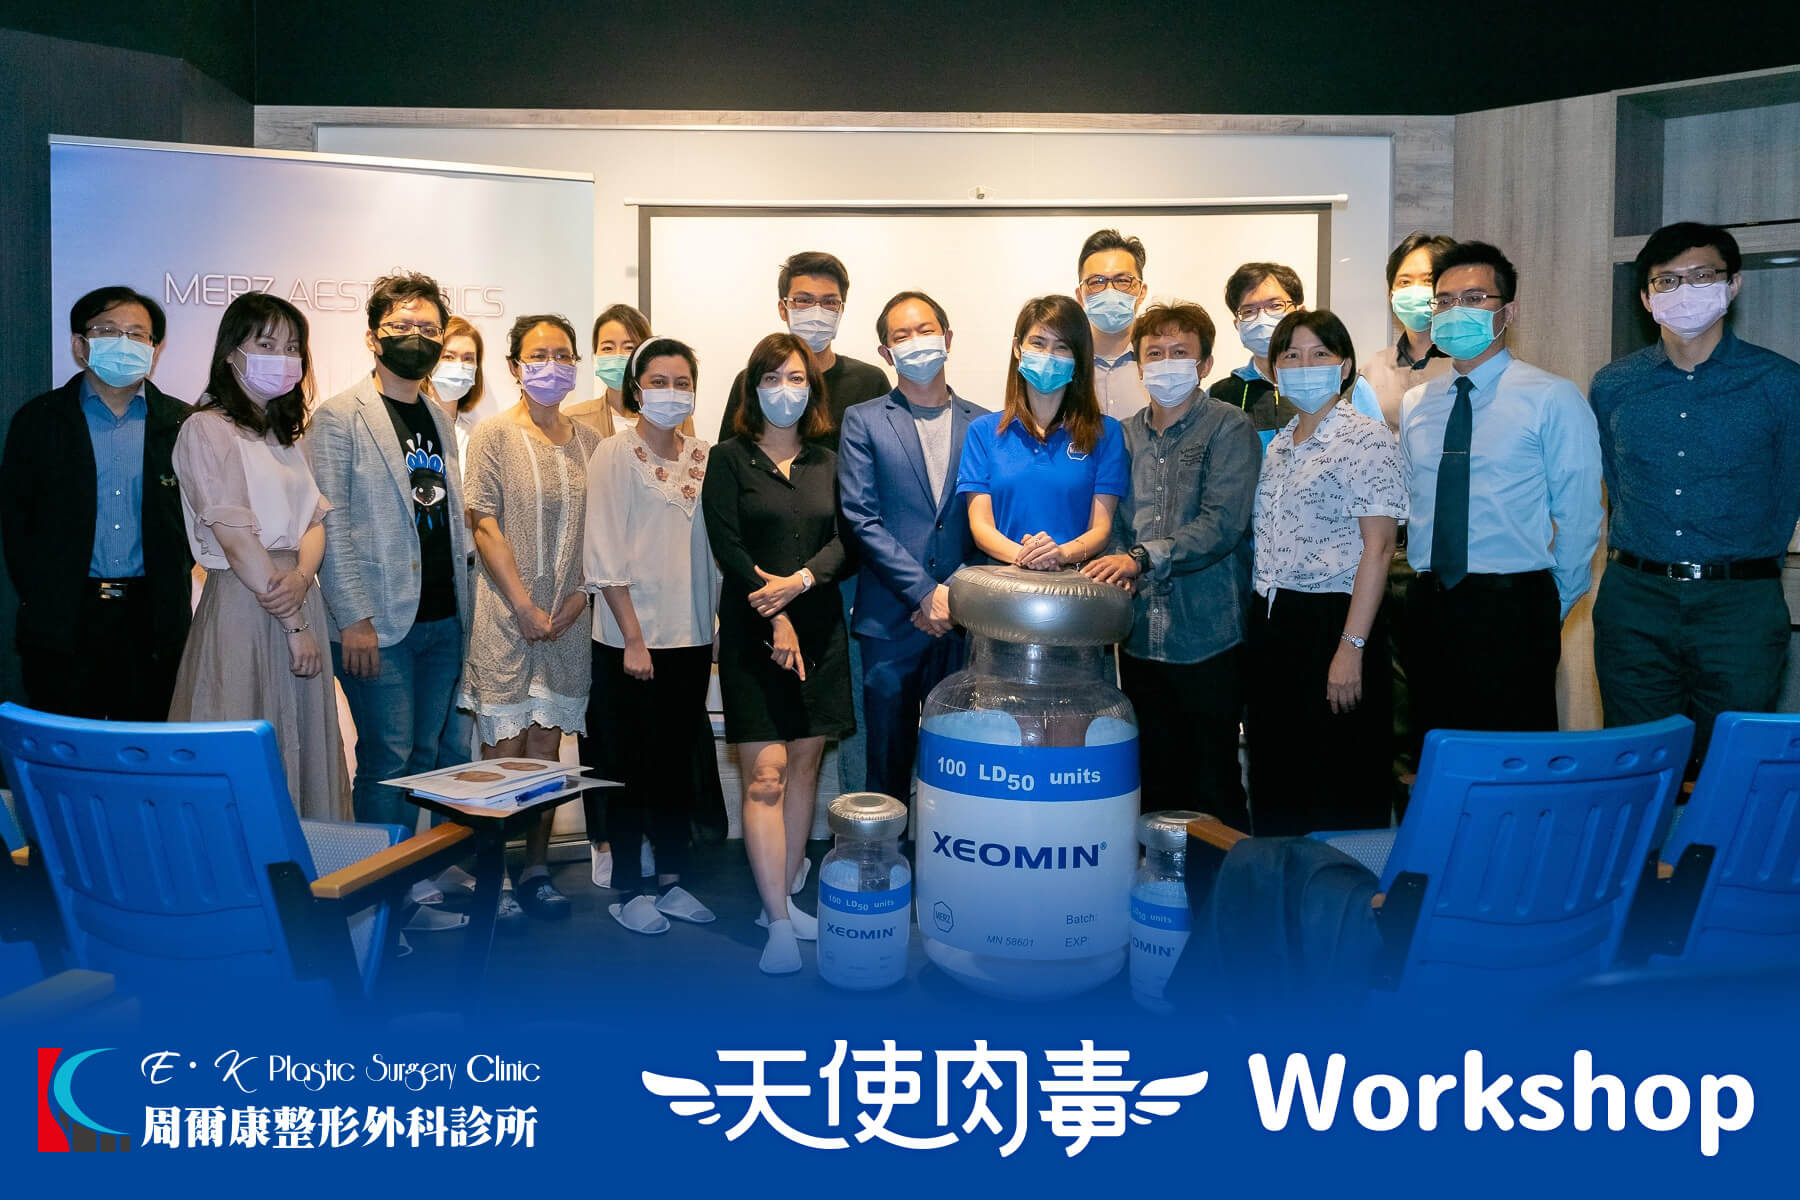 2020-04-19_FB+Line發文-XeominWorkShop-v0